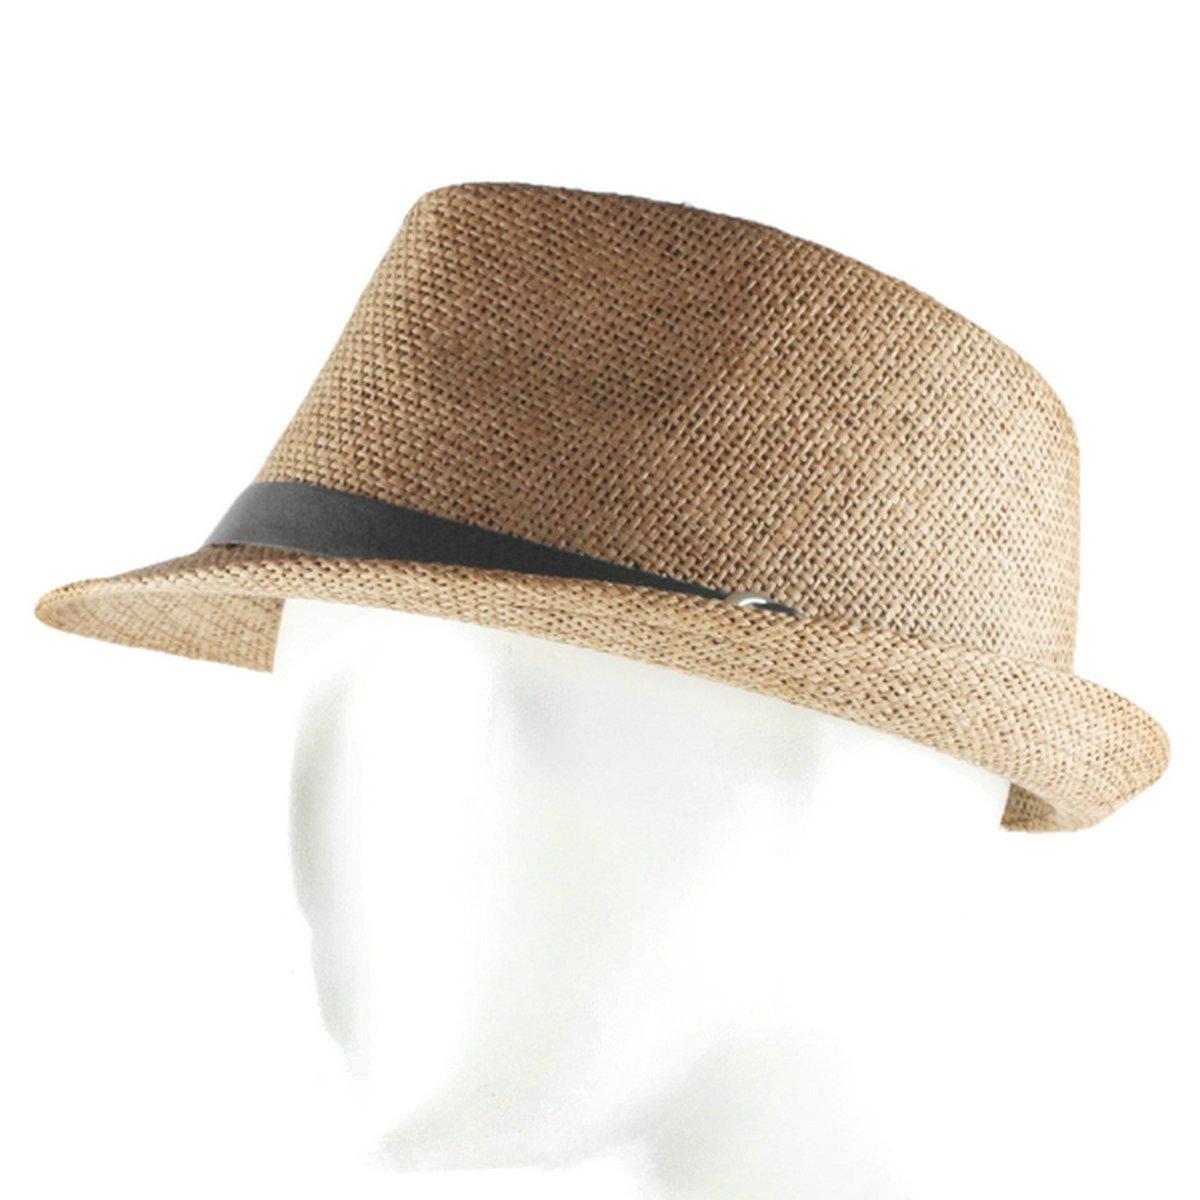 e56d4eed611714 ... Samtree Fedora Hats for Women Men, Short Brim Belt Braid Straw Jazz Cap  Short Brim ...